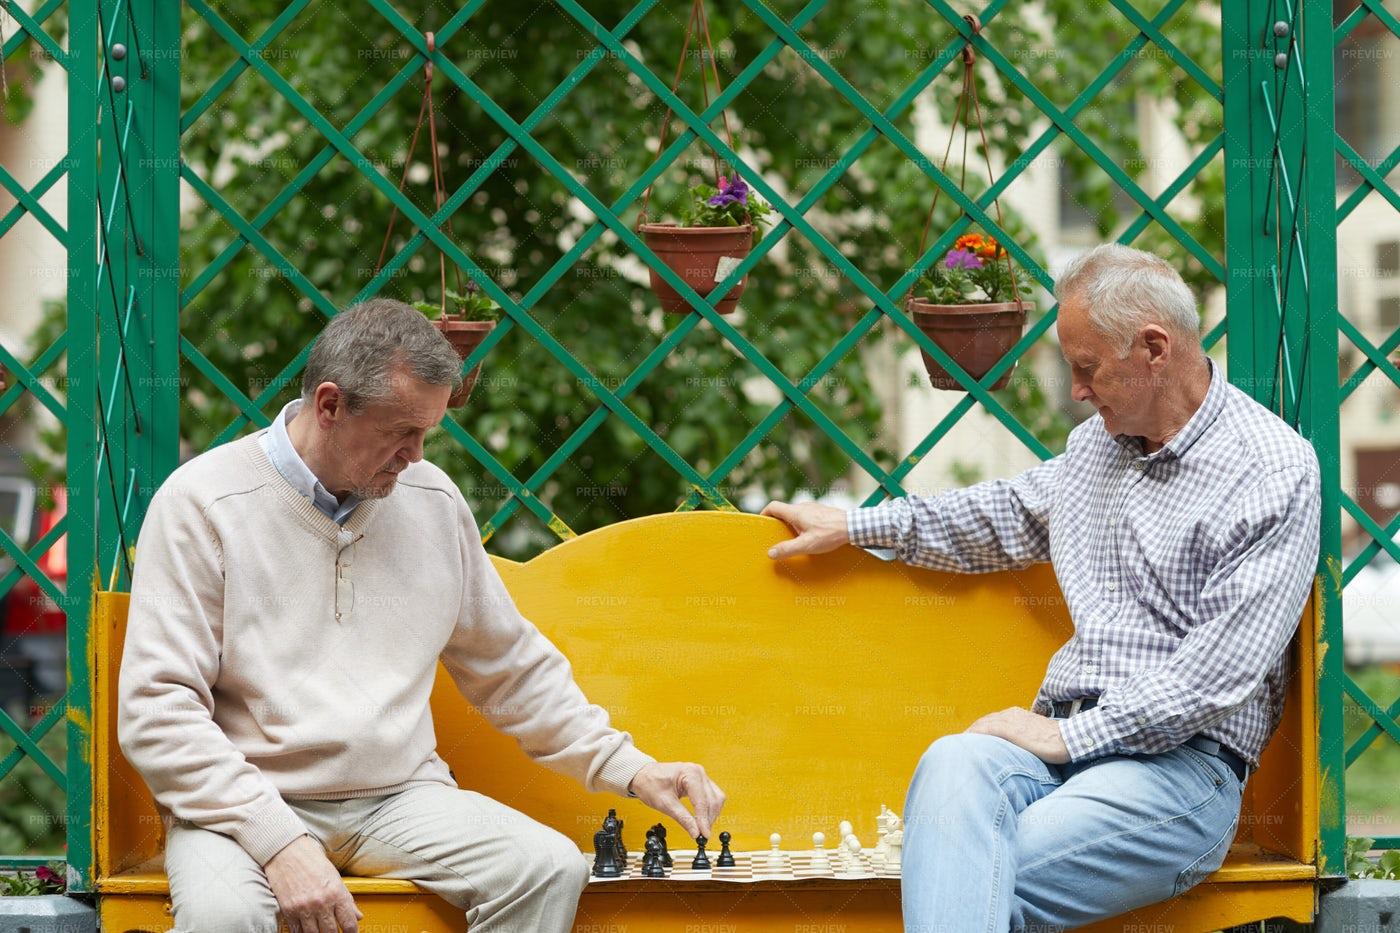 Playing Chess In Garden: Stock Photos